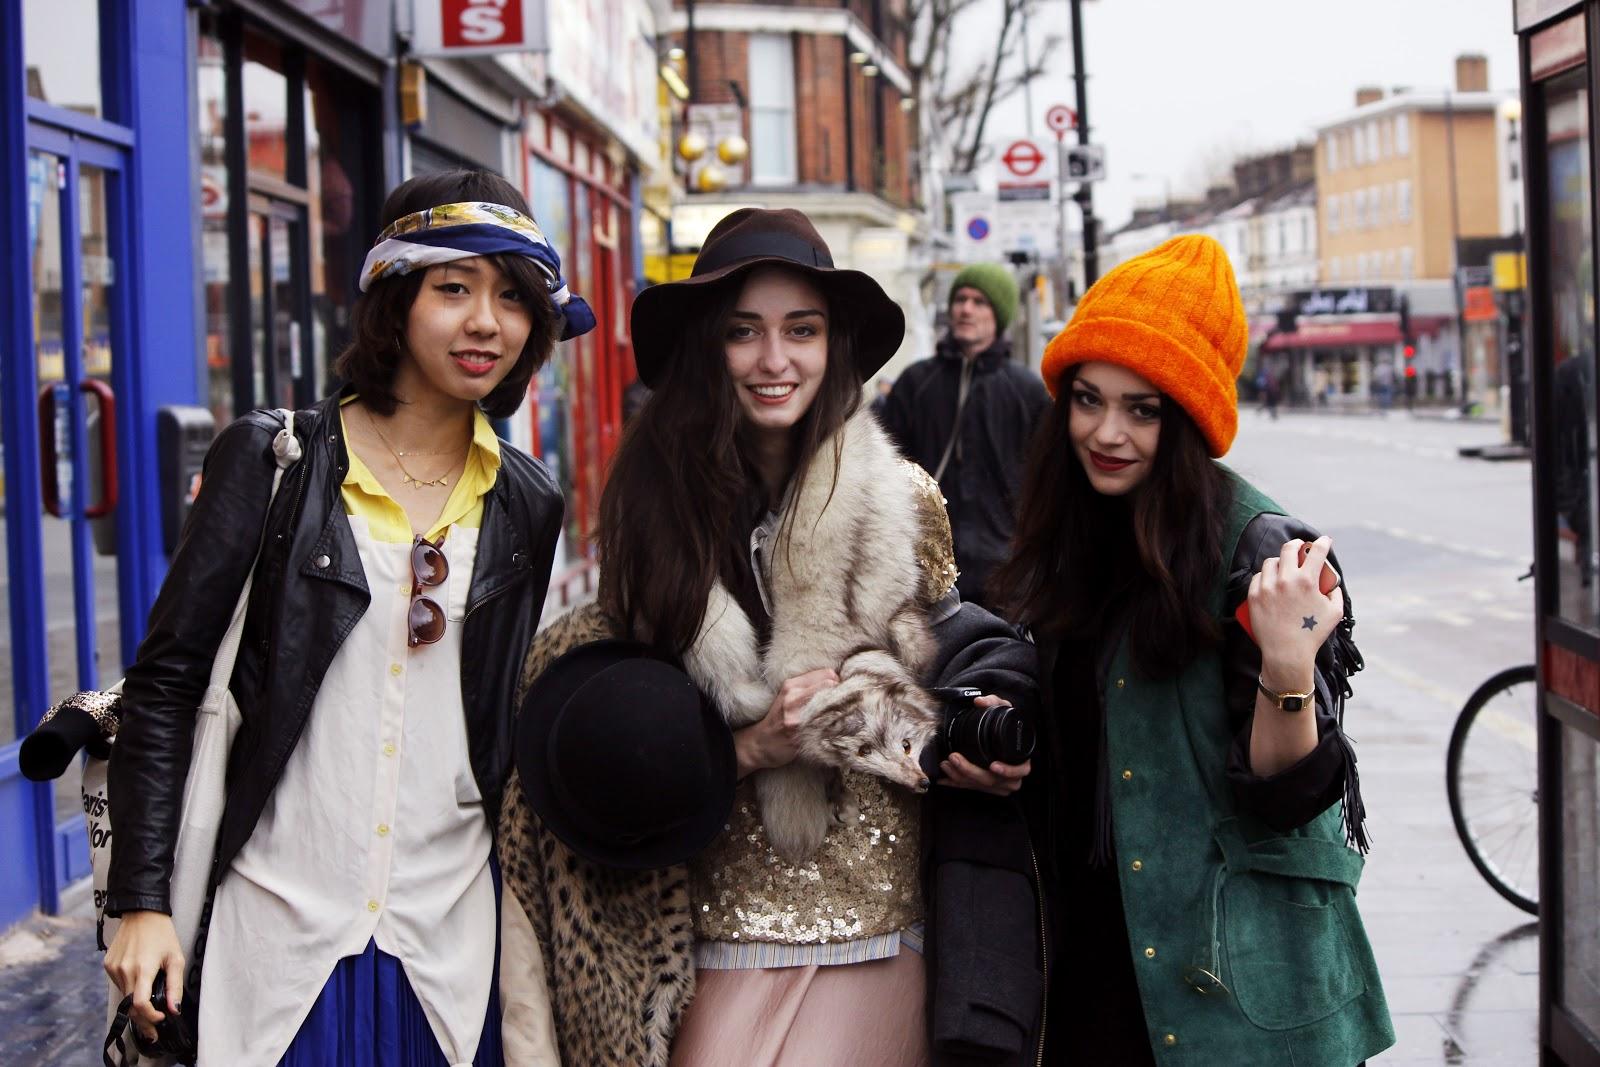 Весна 2013.  Такако, Илона и Лиа рано утром позируют для  фотопортфолио